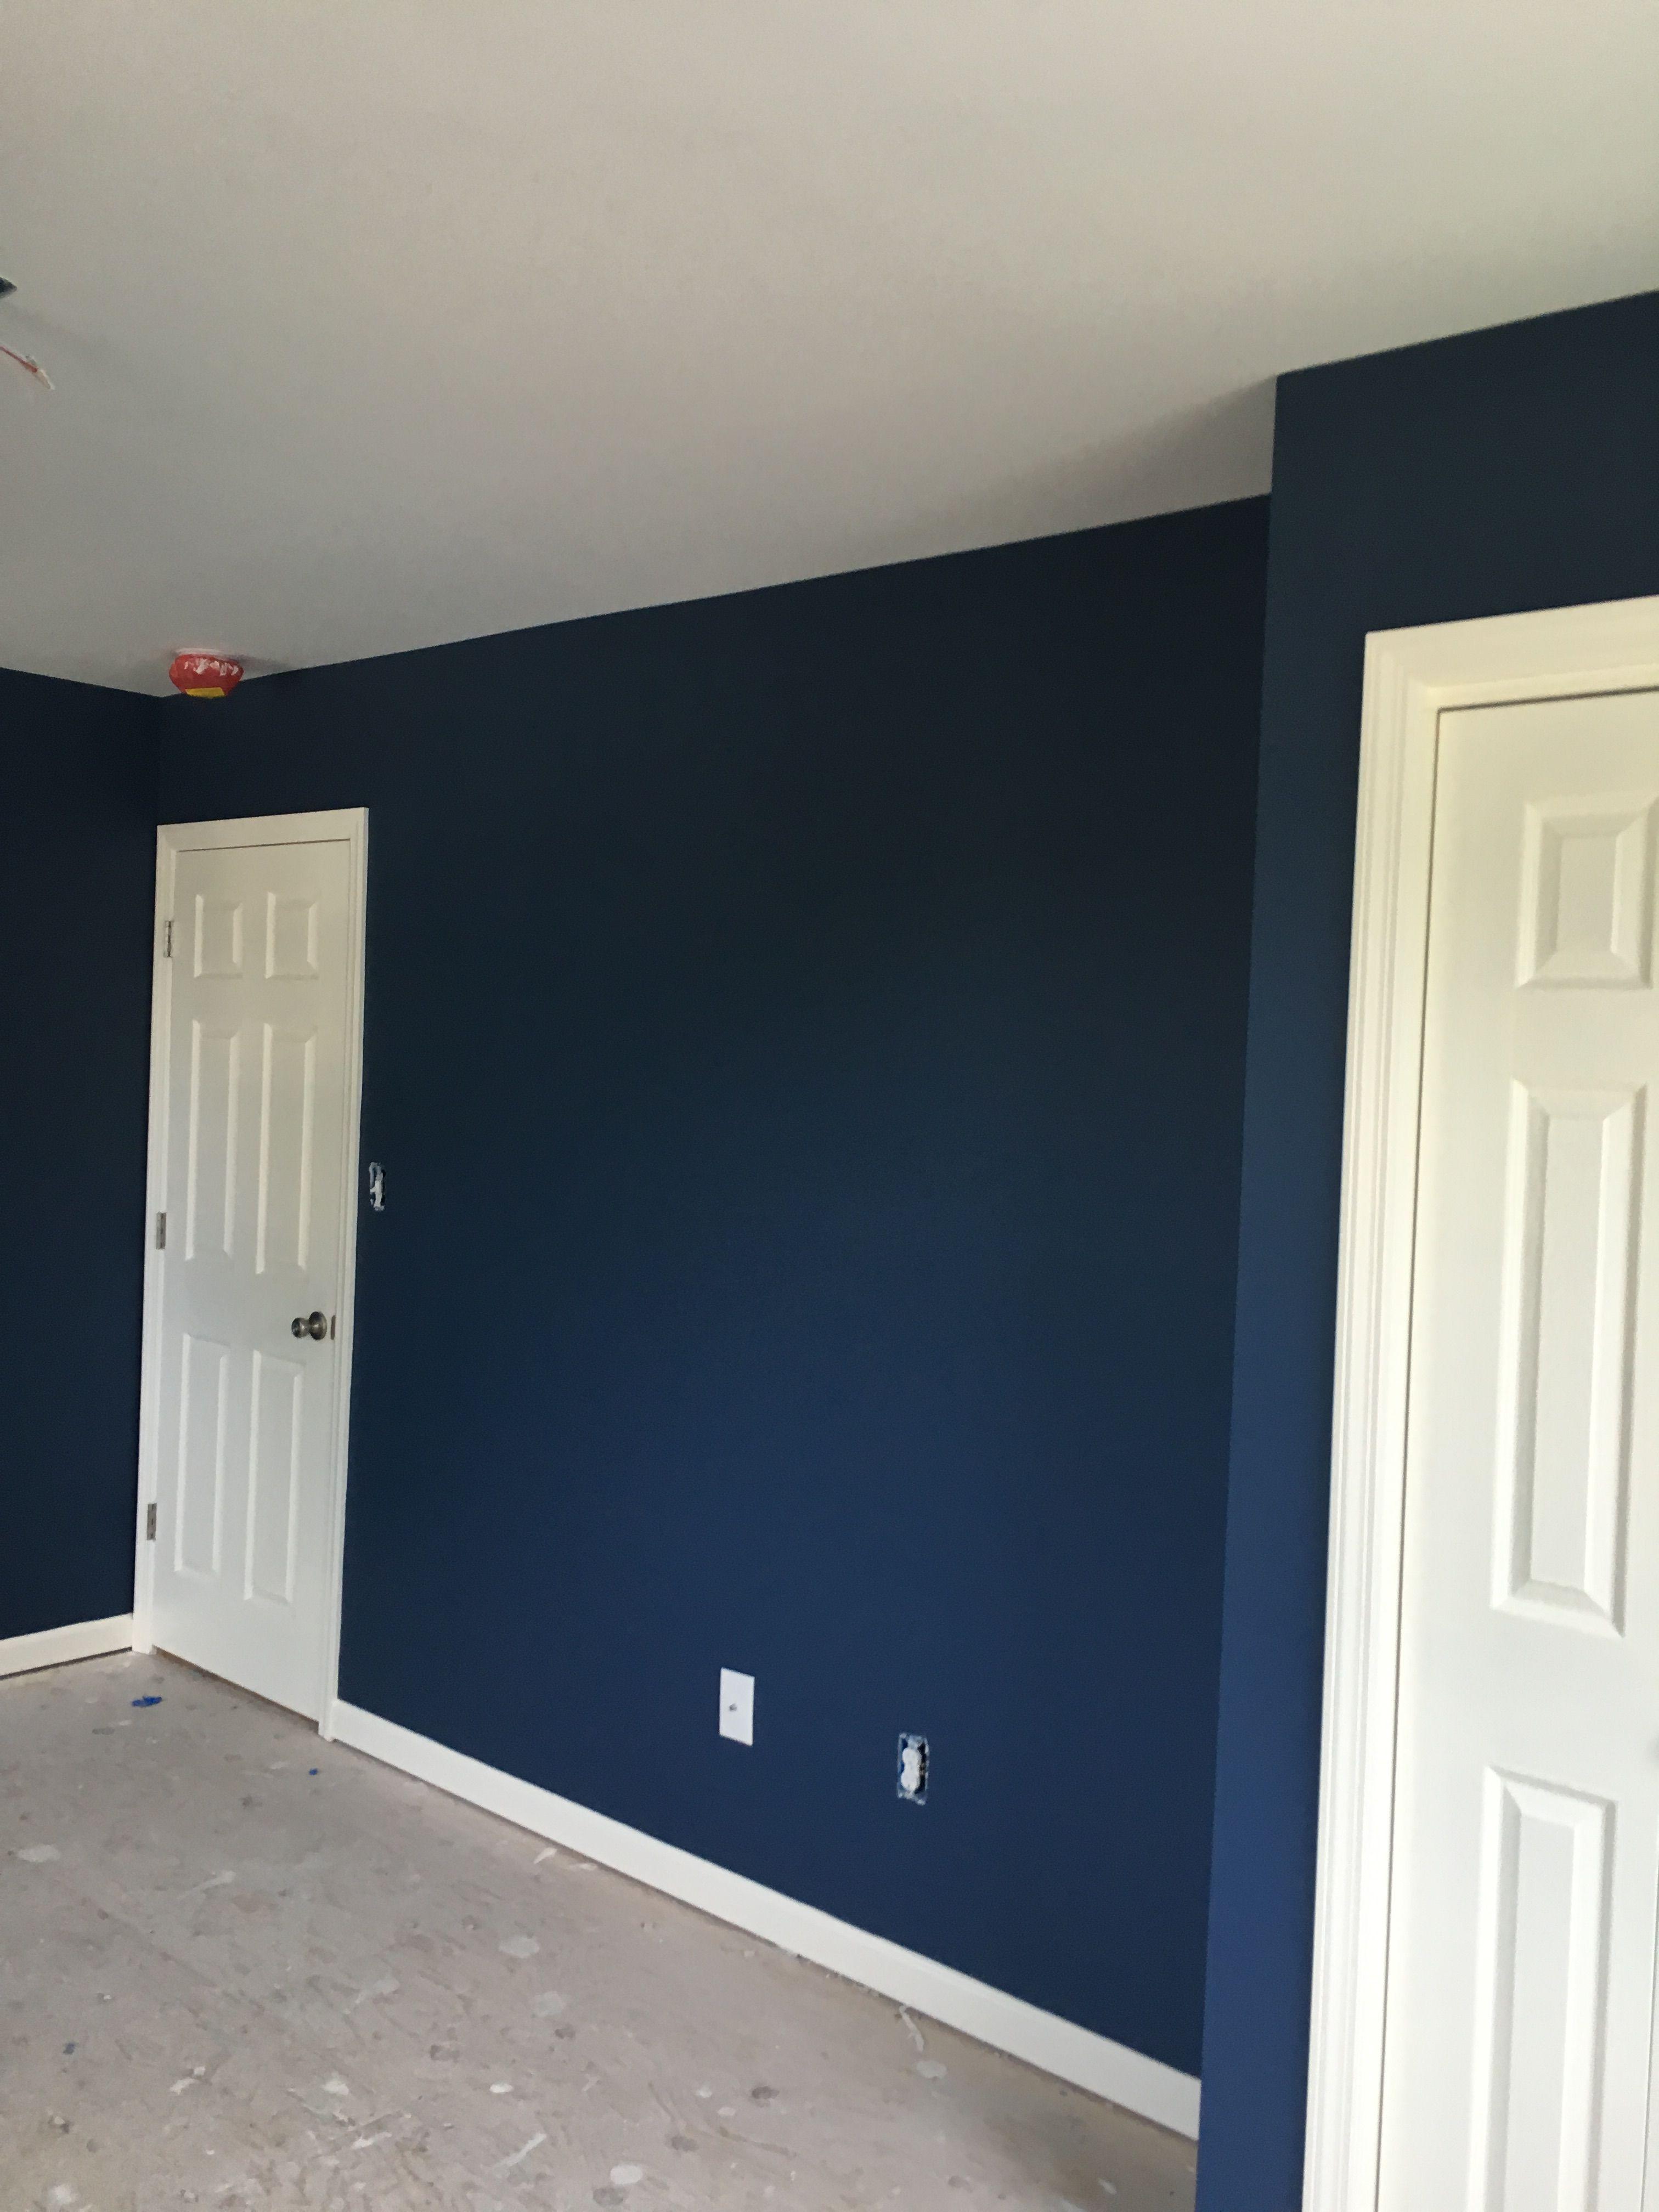 A Fresh Coat Of Walls Benjamin Moore Kensington Blue Matte Finish Ceiling Regal Flat White Trim Regal Select Wh Blue Accent Walls House Colors New Homes